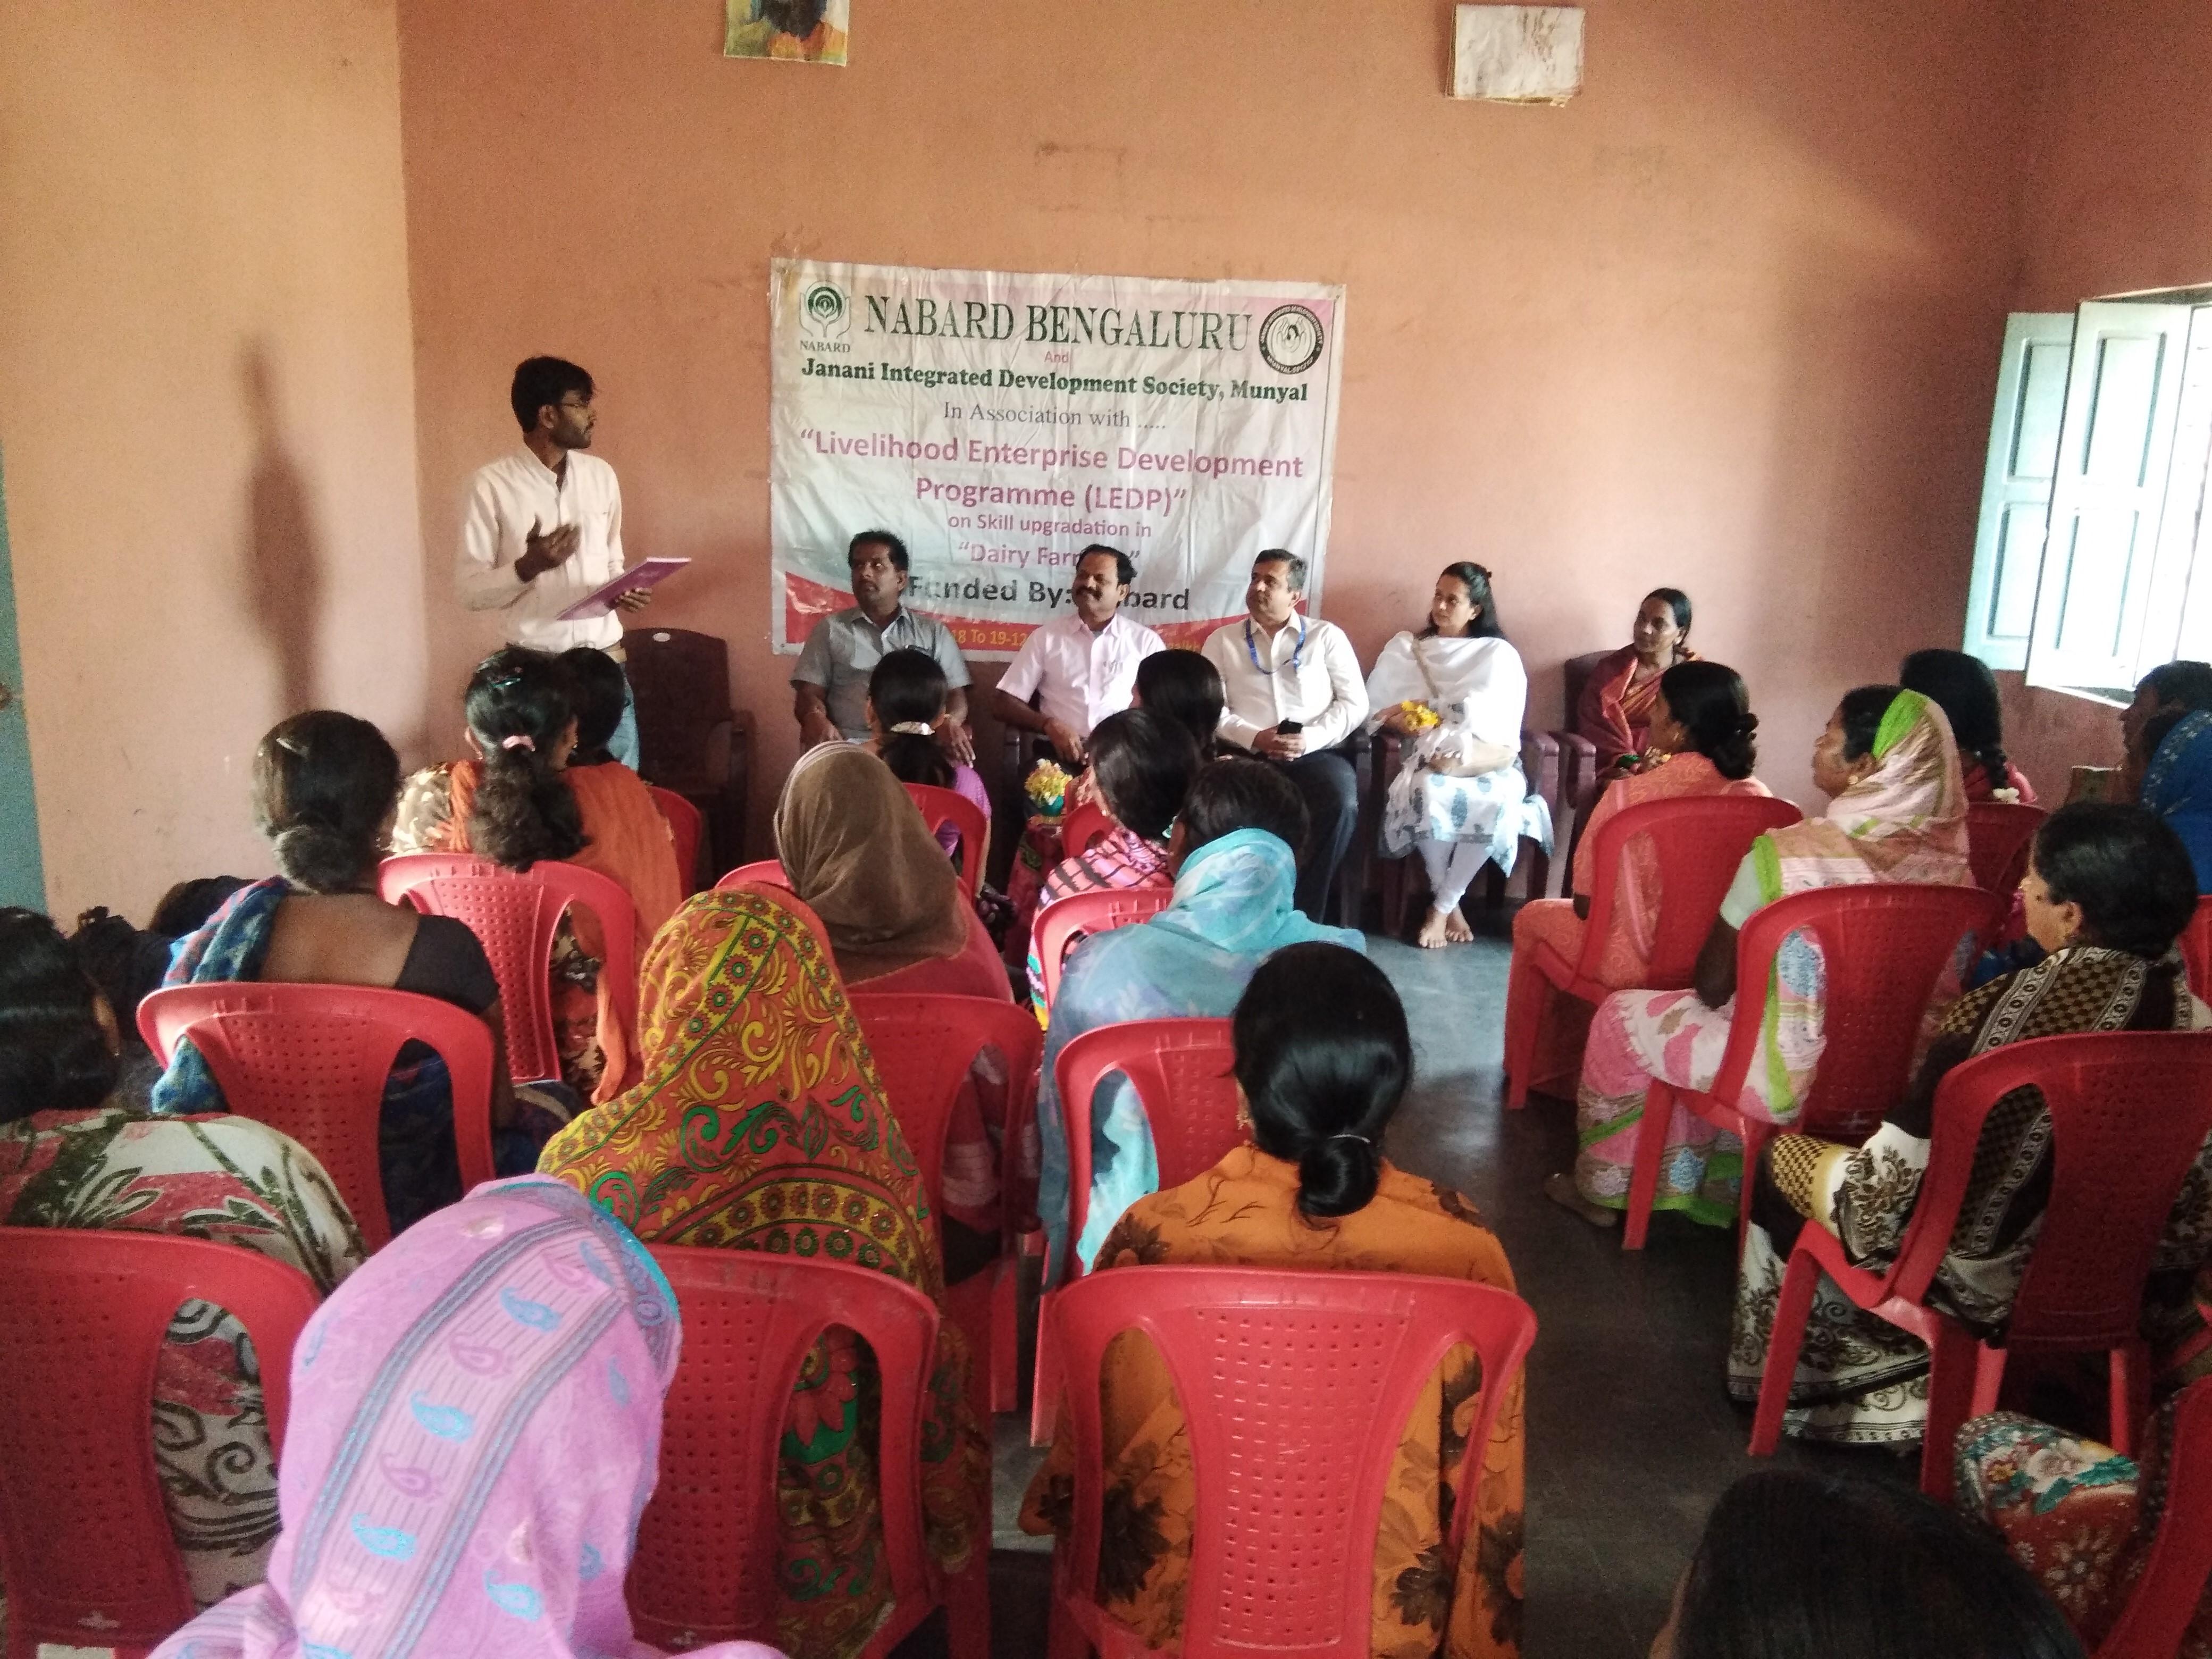 /media/janani/1NGO-00255-Janani_Integrated_Development_Society_R-Activities-LEDP_Training_program.jpg